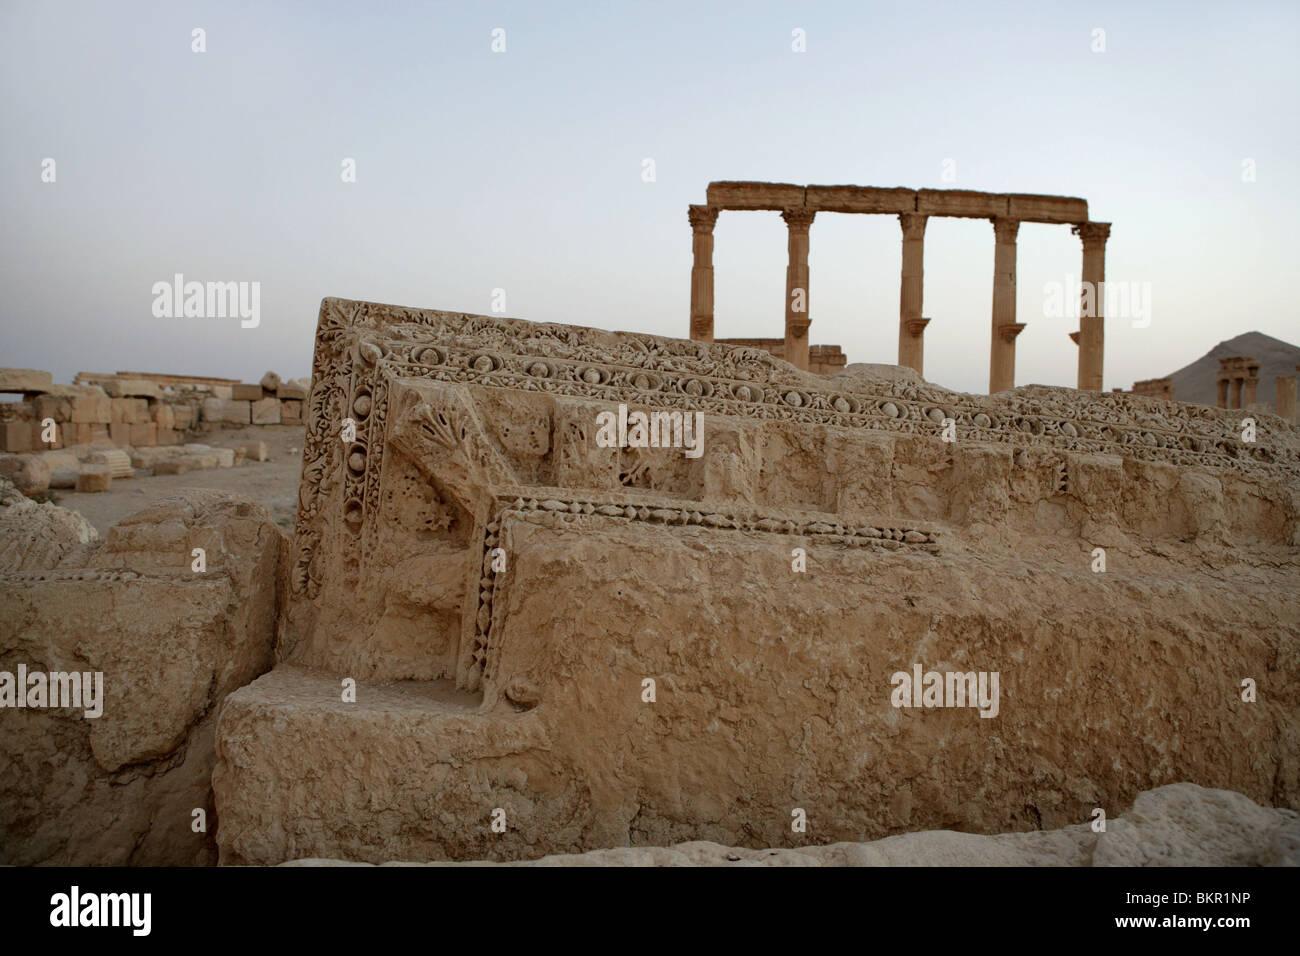 Decorated entablature, Roman ruins. Palmyra, Syria - Stock Image